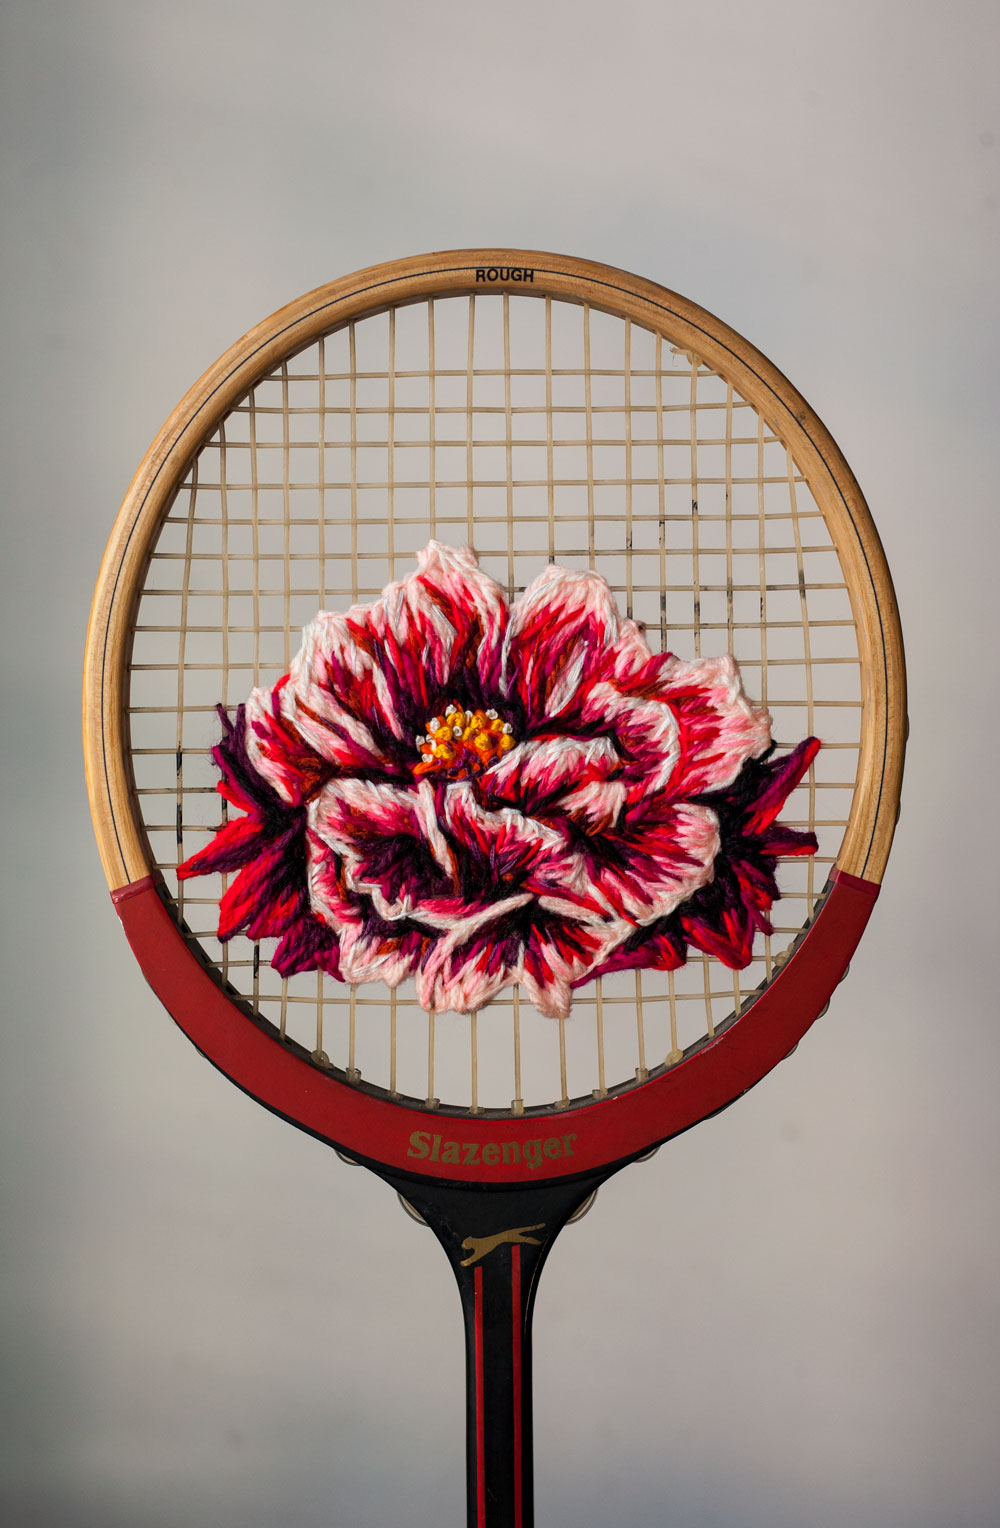 danielle-clough-racket-goodfromyou-3.jpg